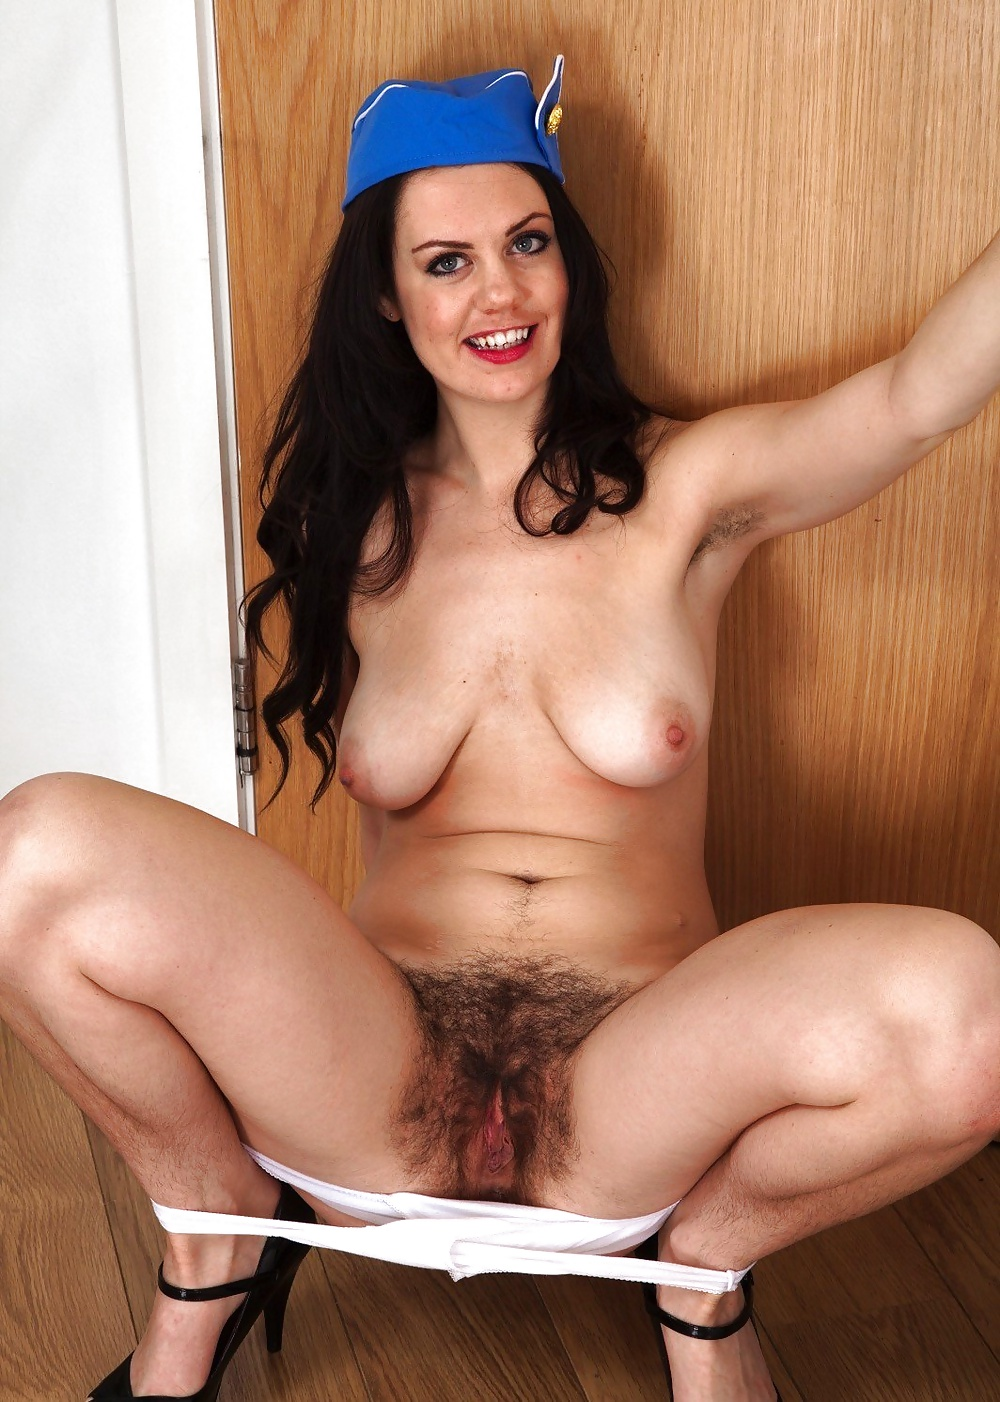 Nude squat hairy tube dress fuck deepthroat